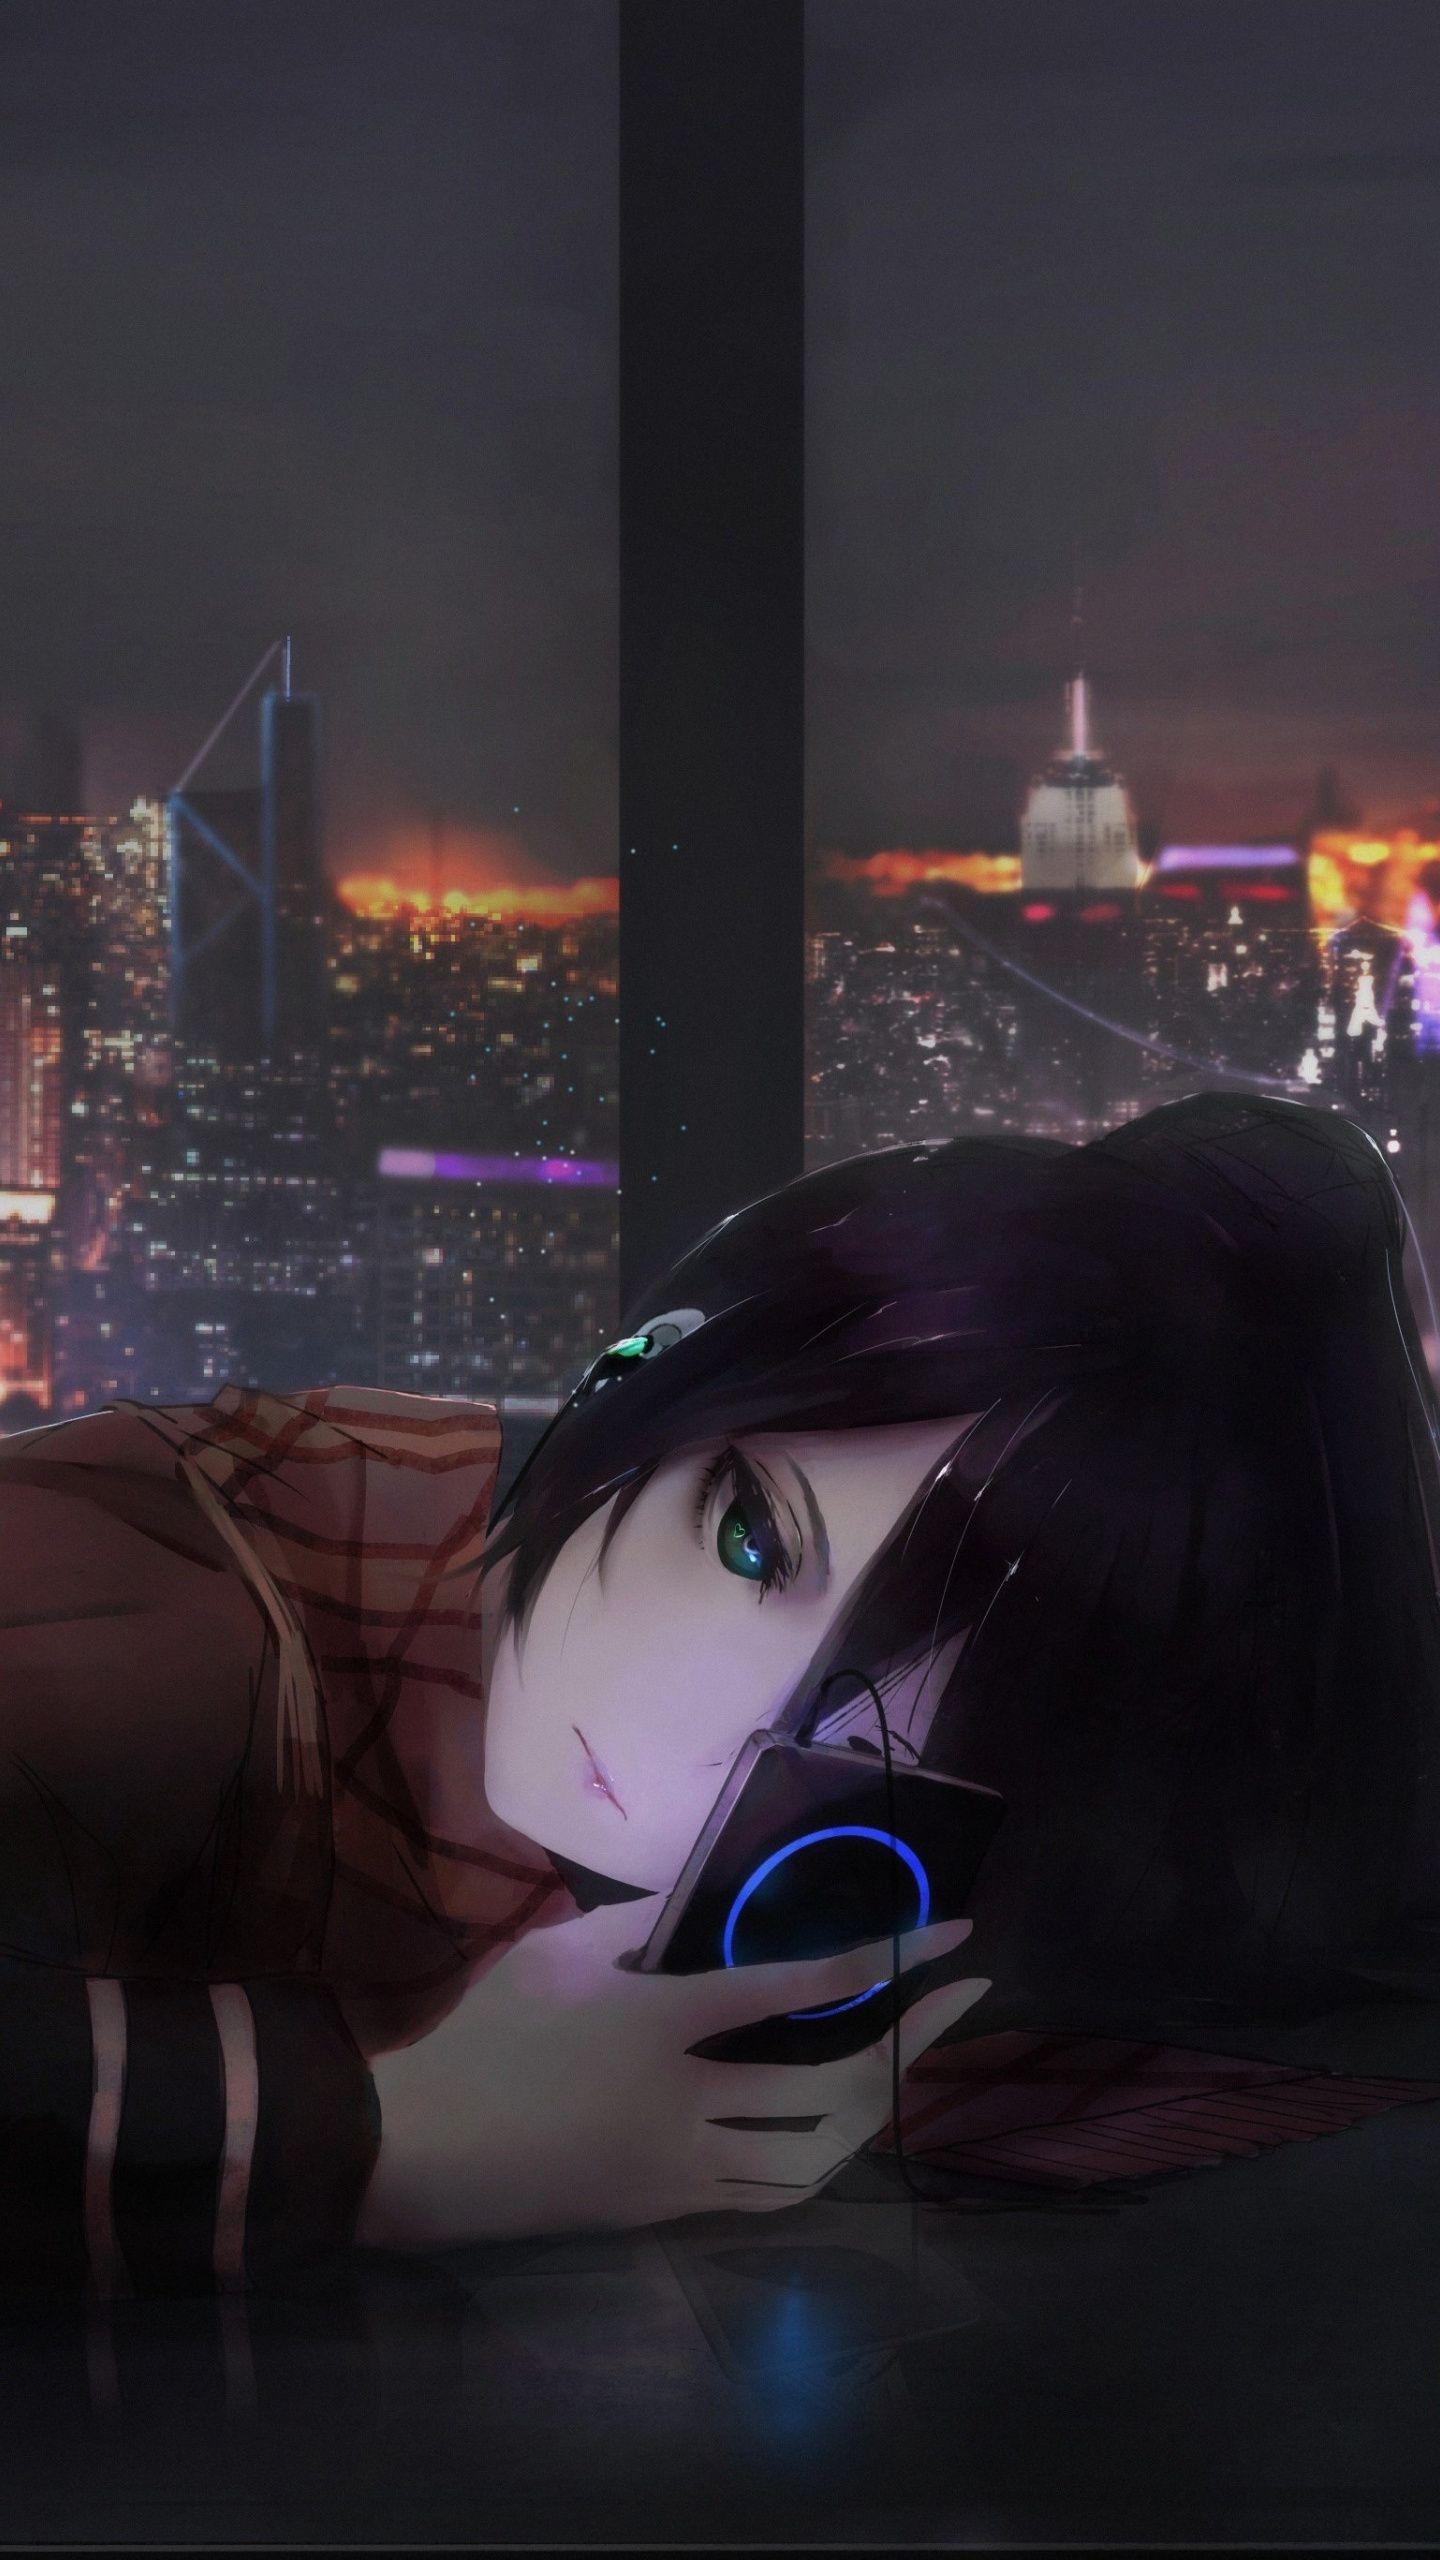 Wallpaper Anime Girl Keren 3d gambar ke 11